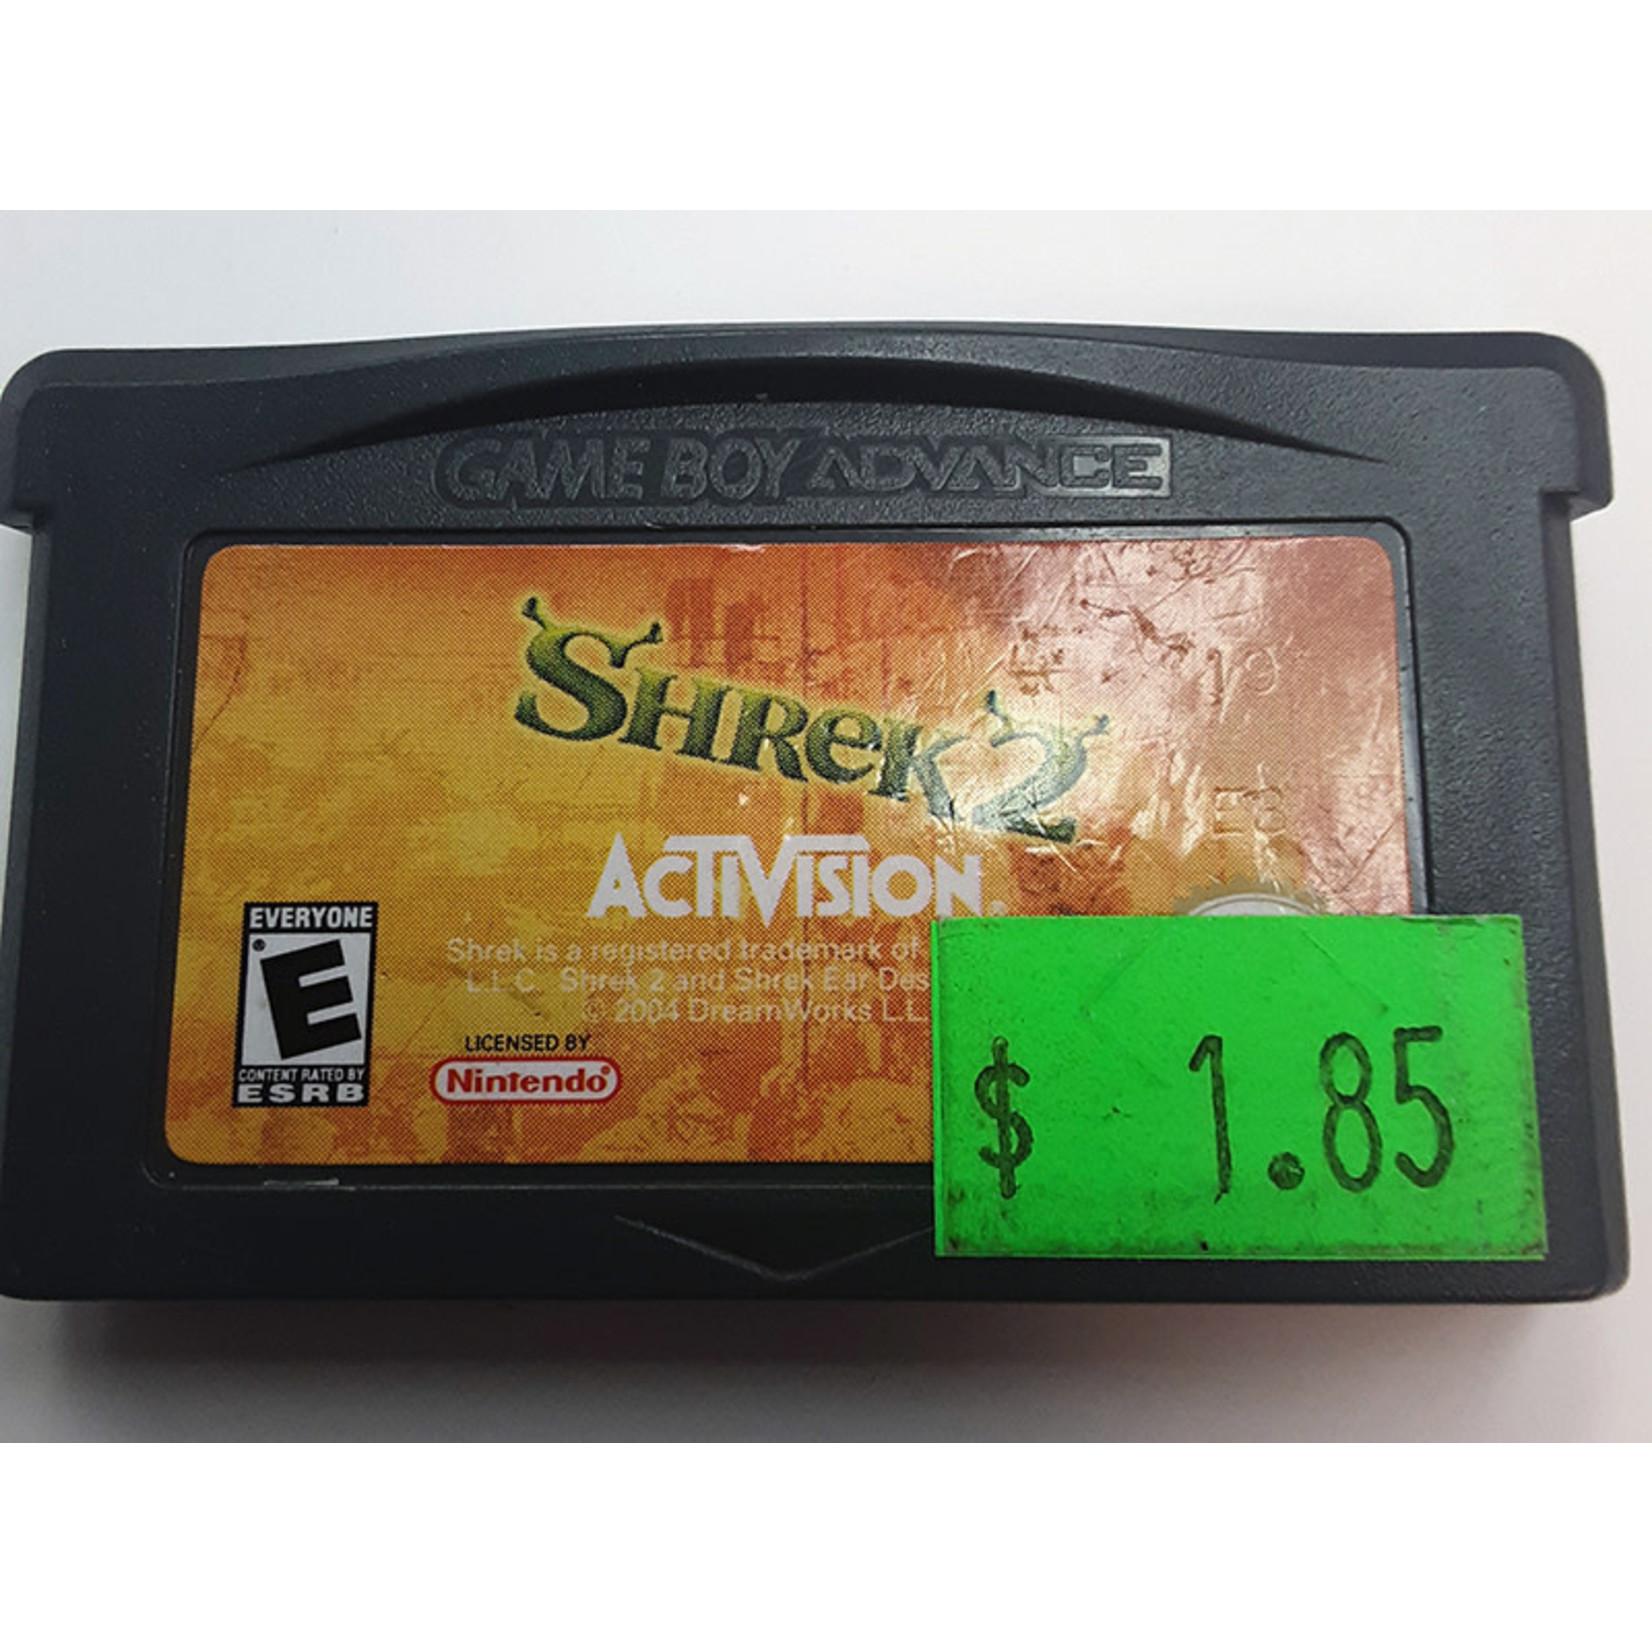 GBAu-Shrek 2 (cartridge)